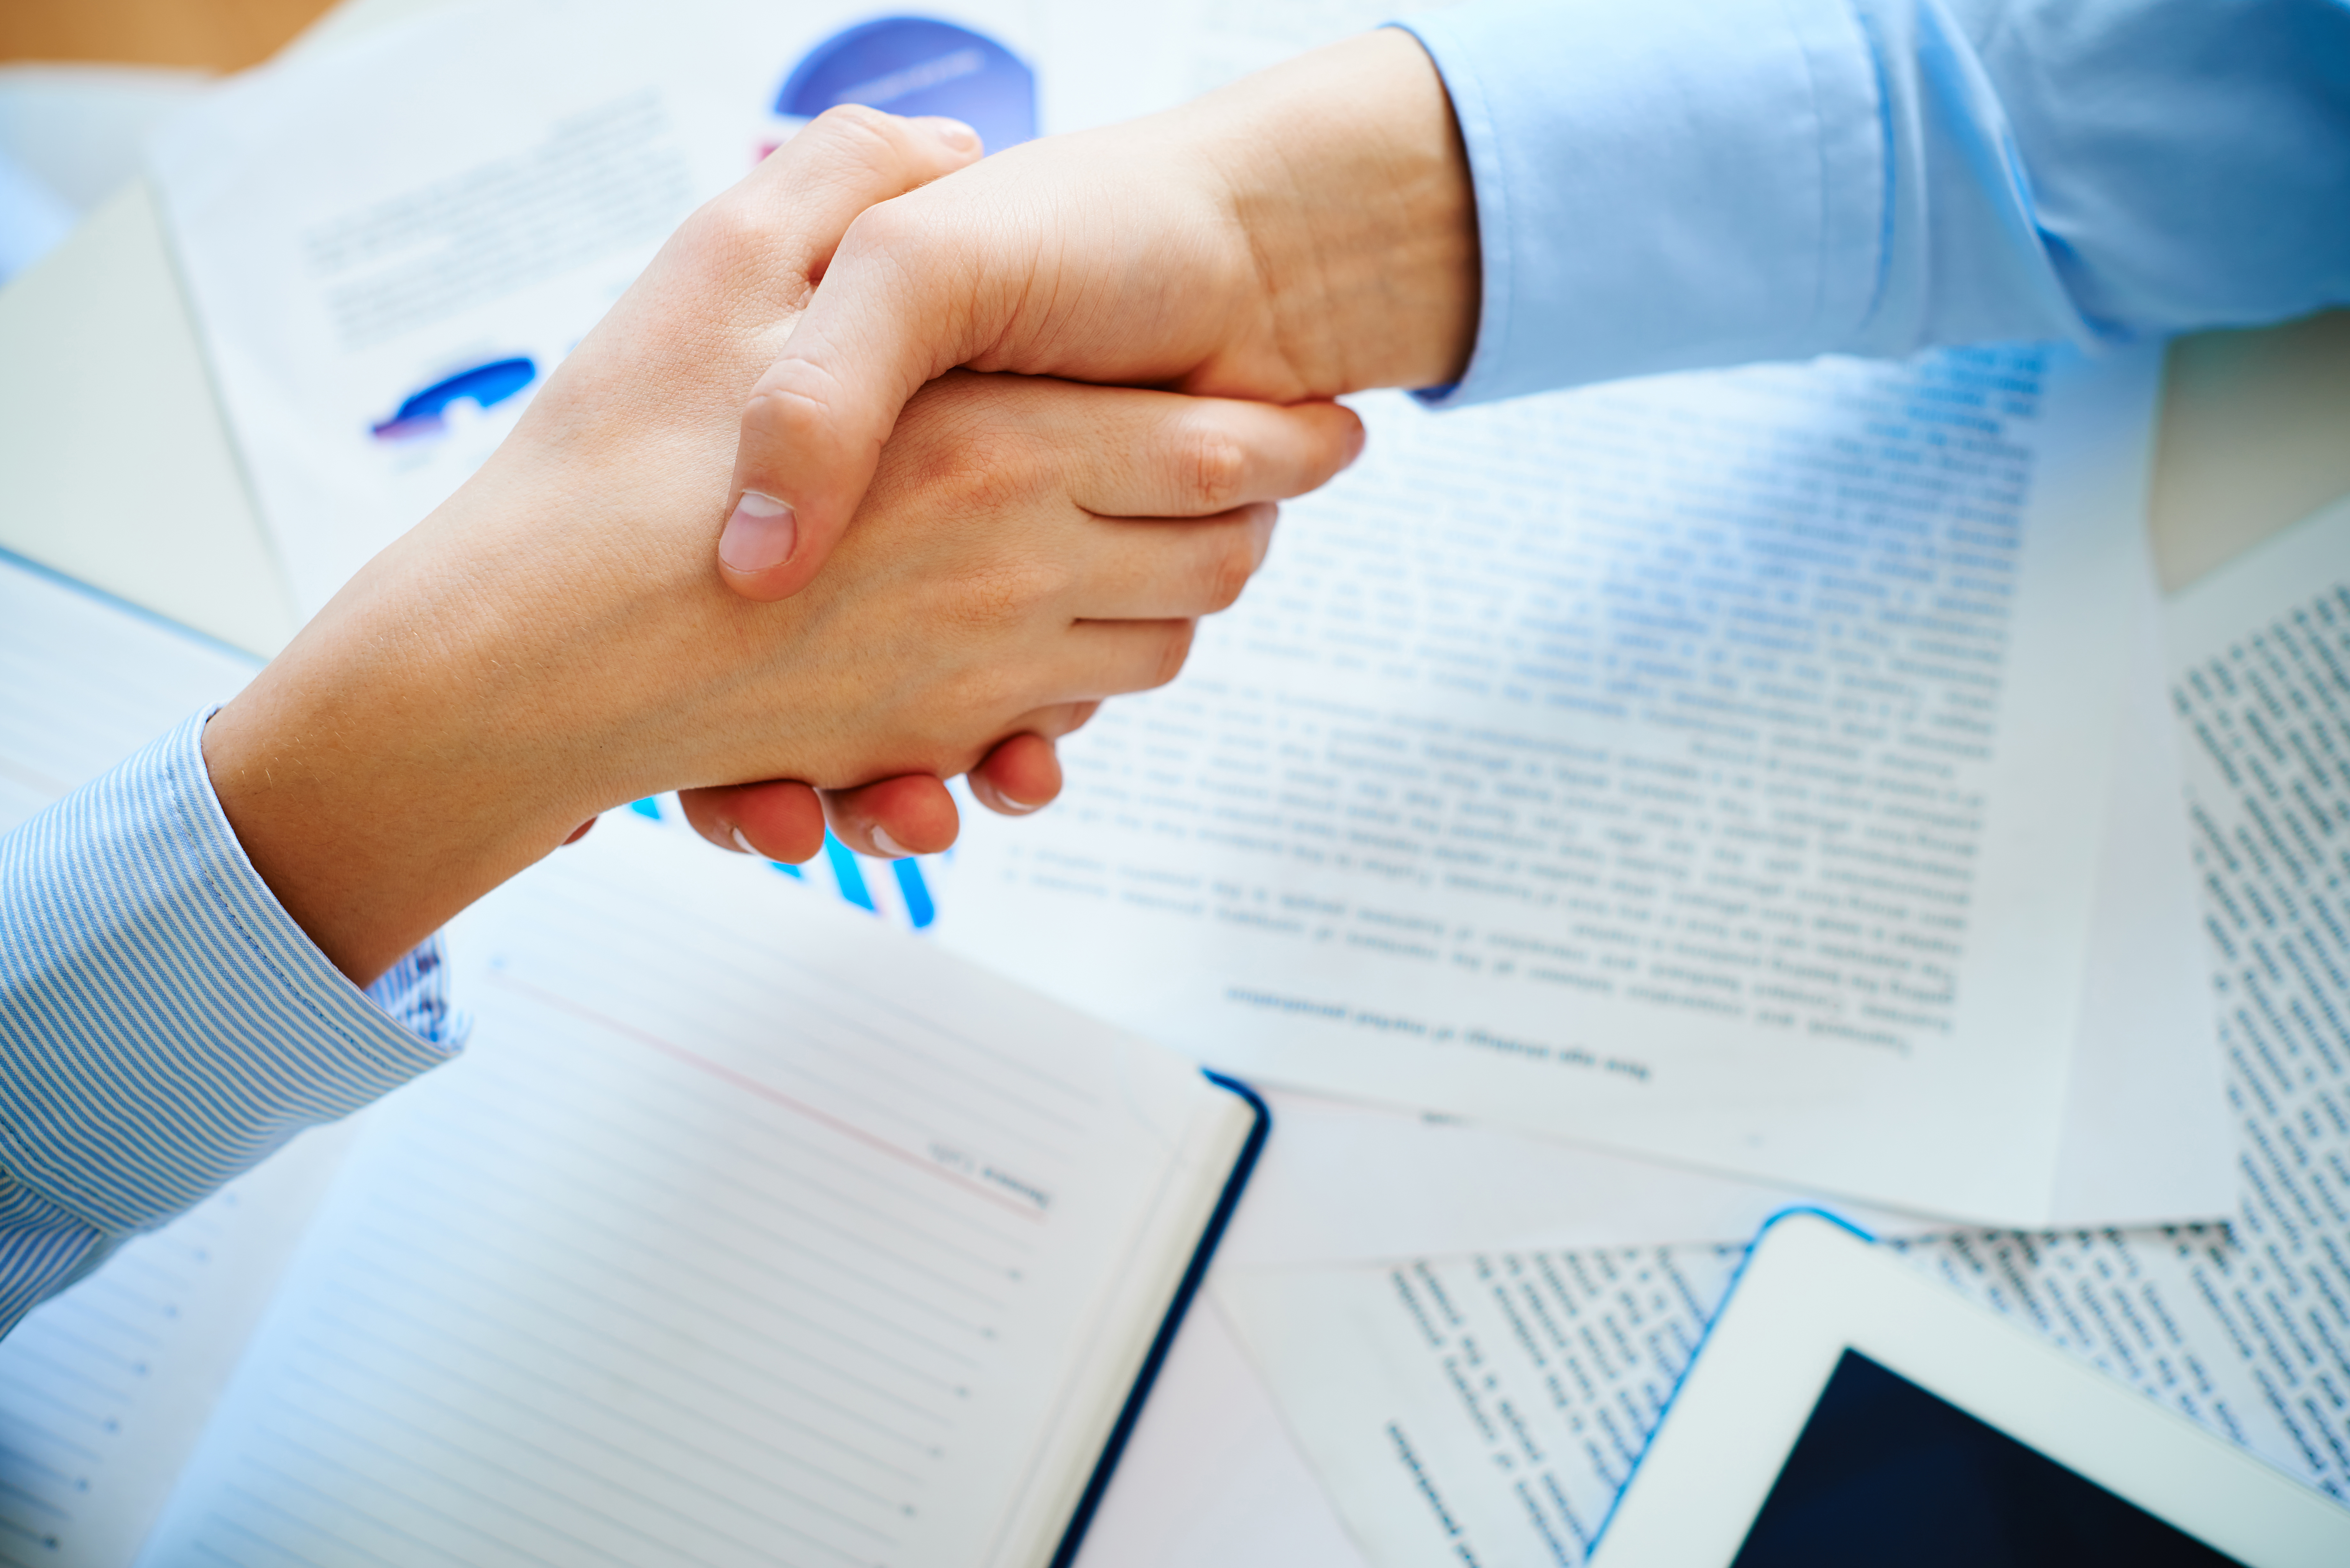 programa de fidelidade para e-commerce